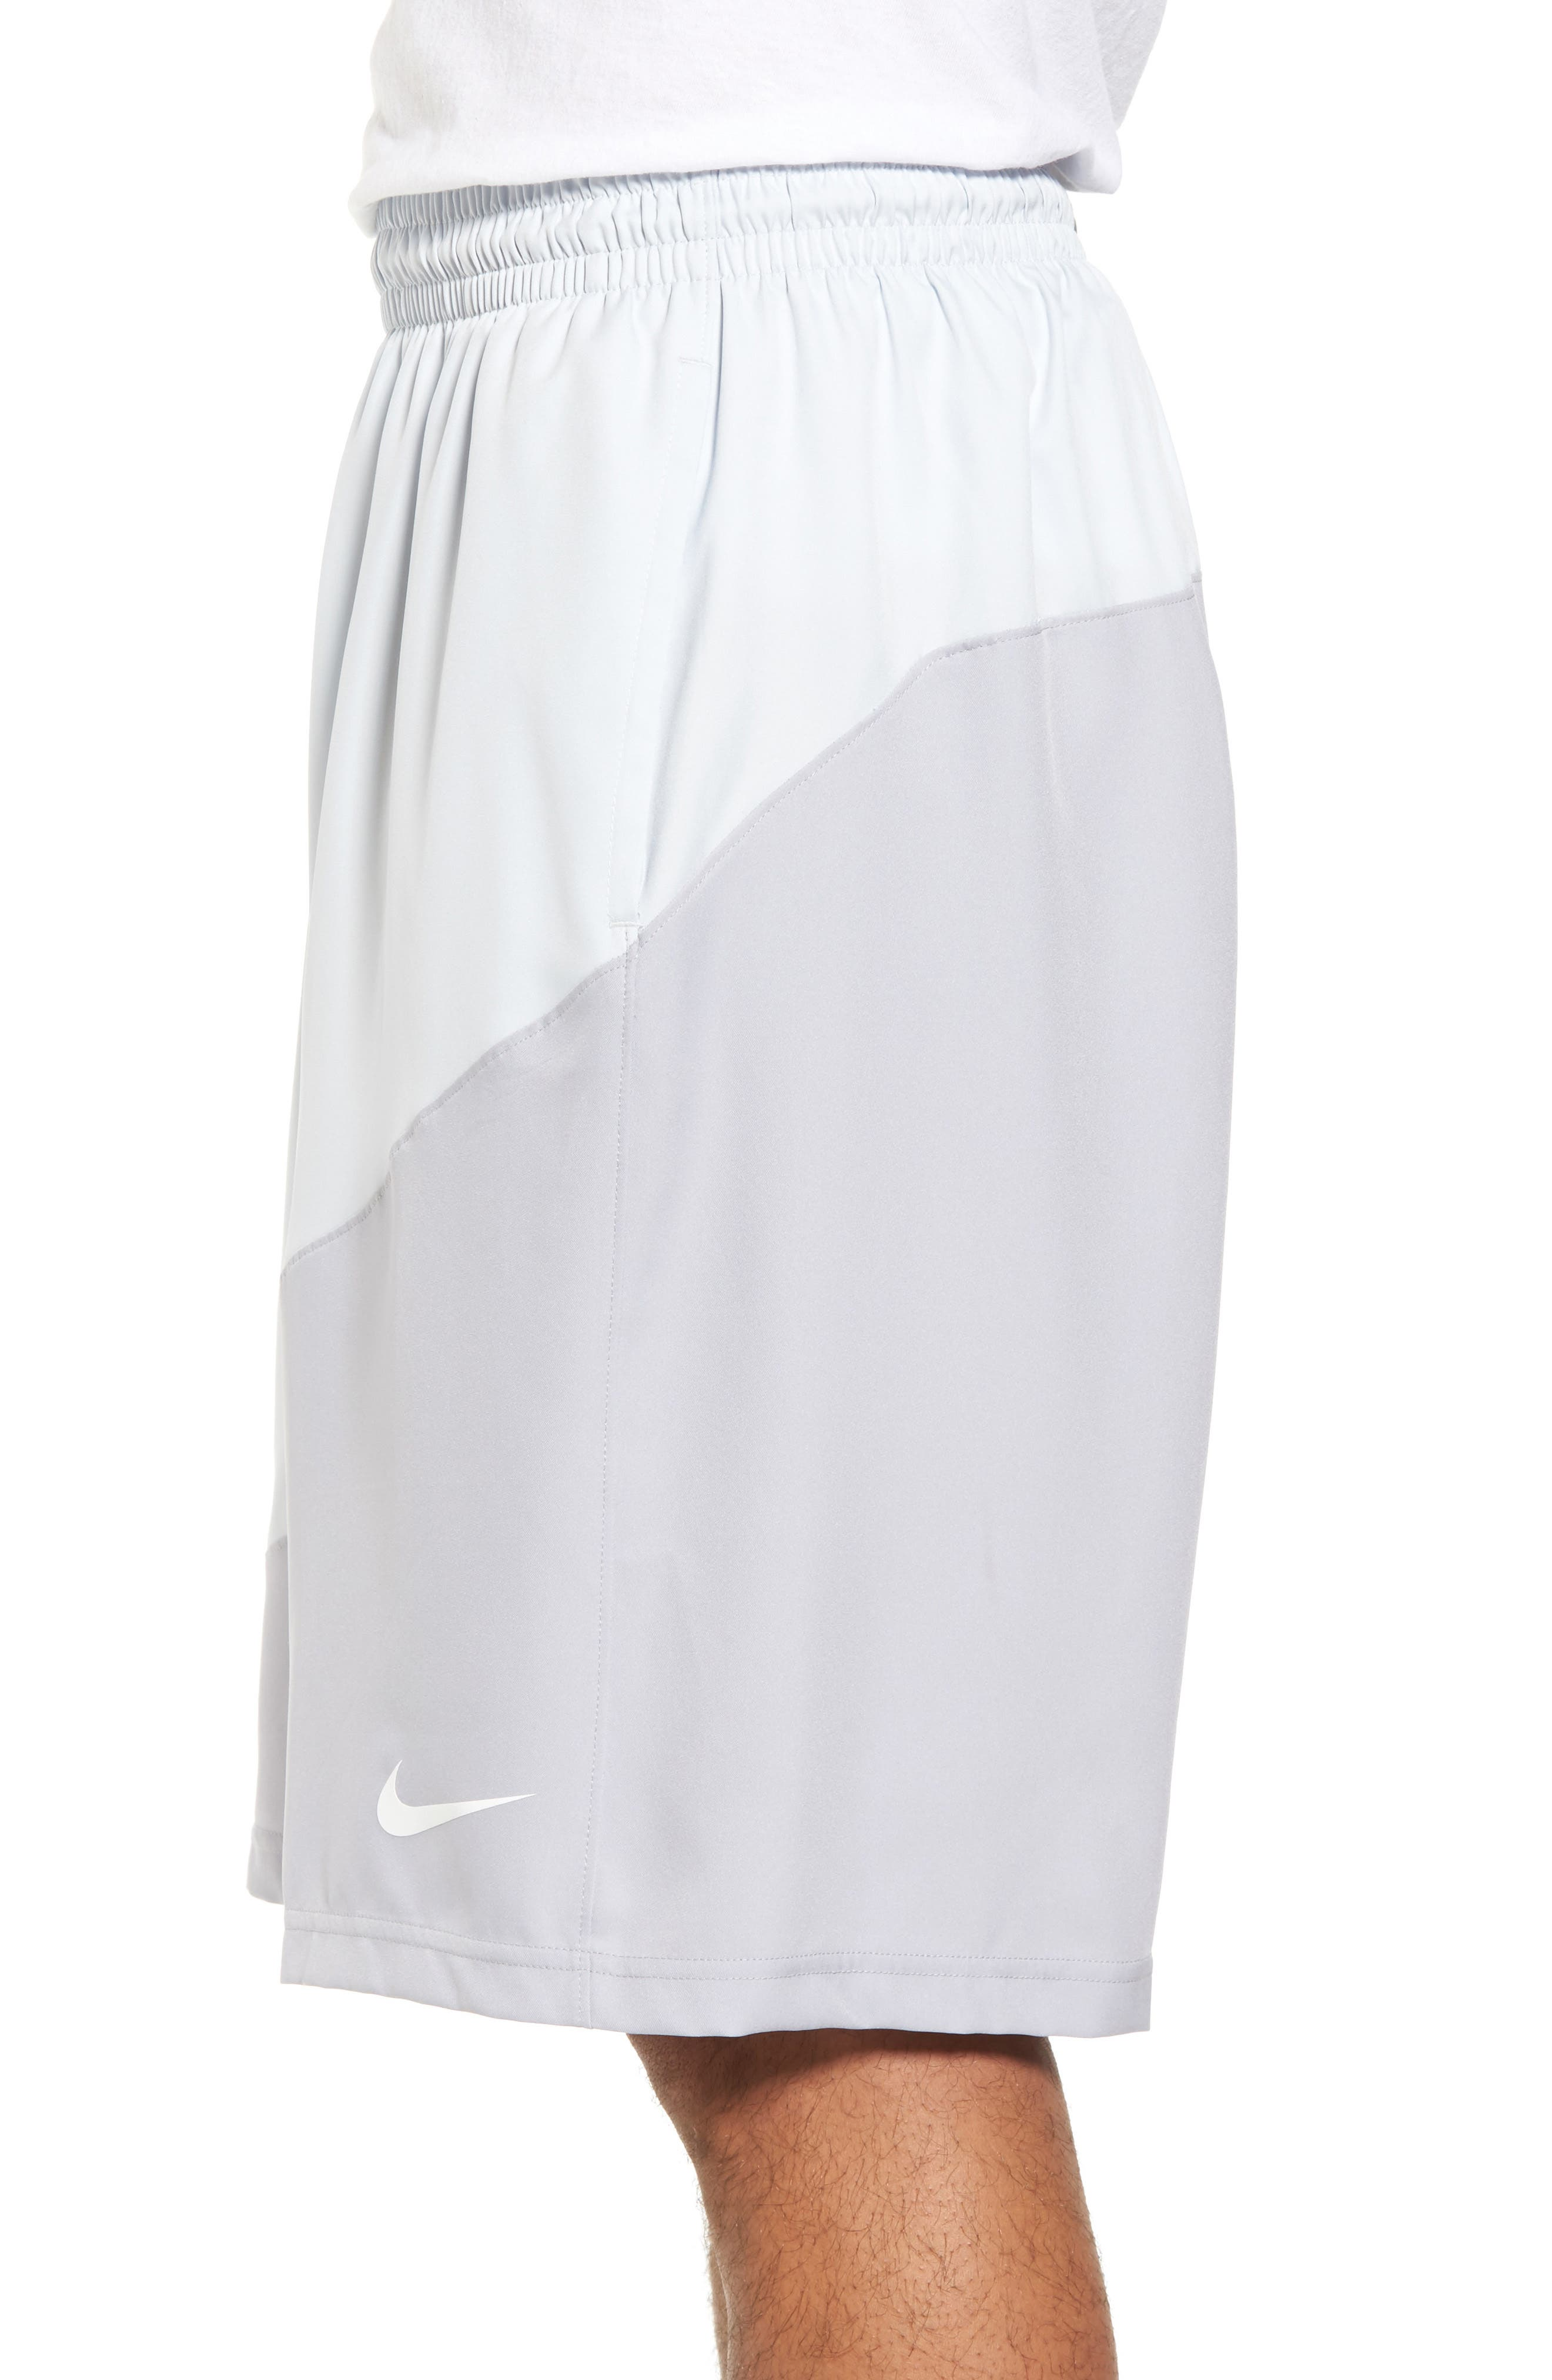 Dry Shorts,                             Alternate thumbnail 3, color,                             027